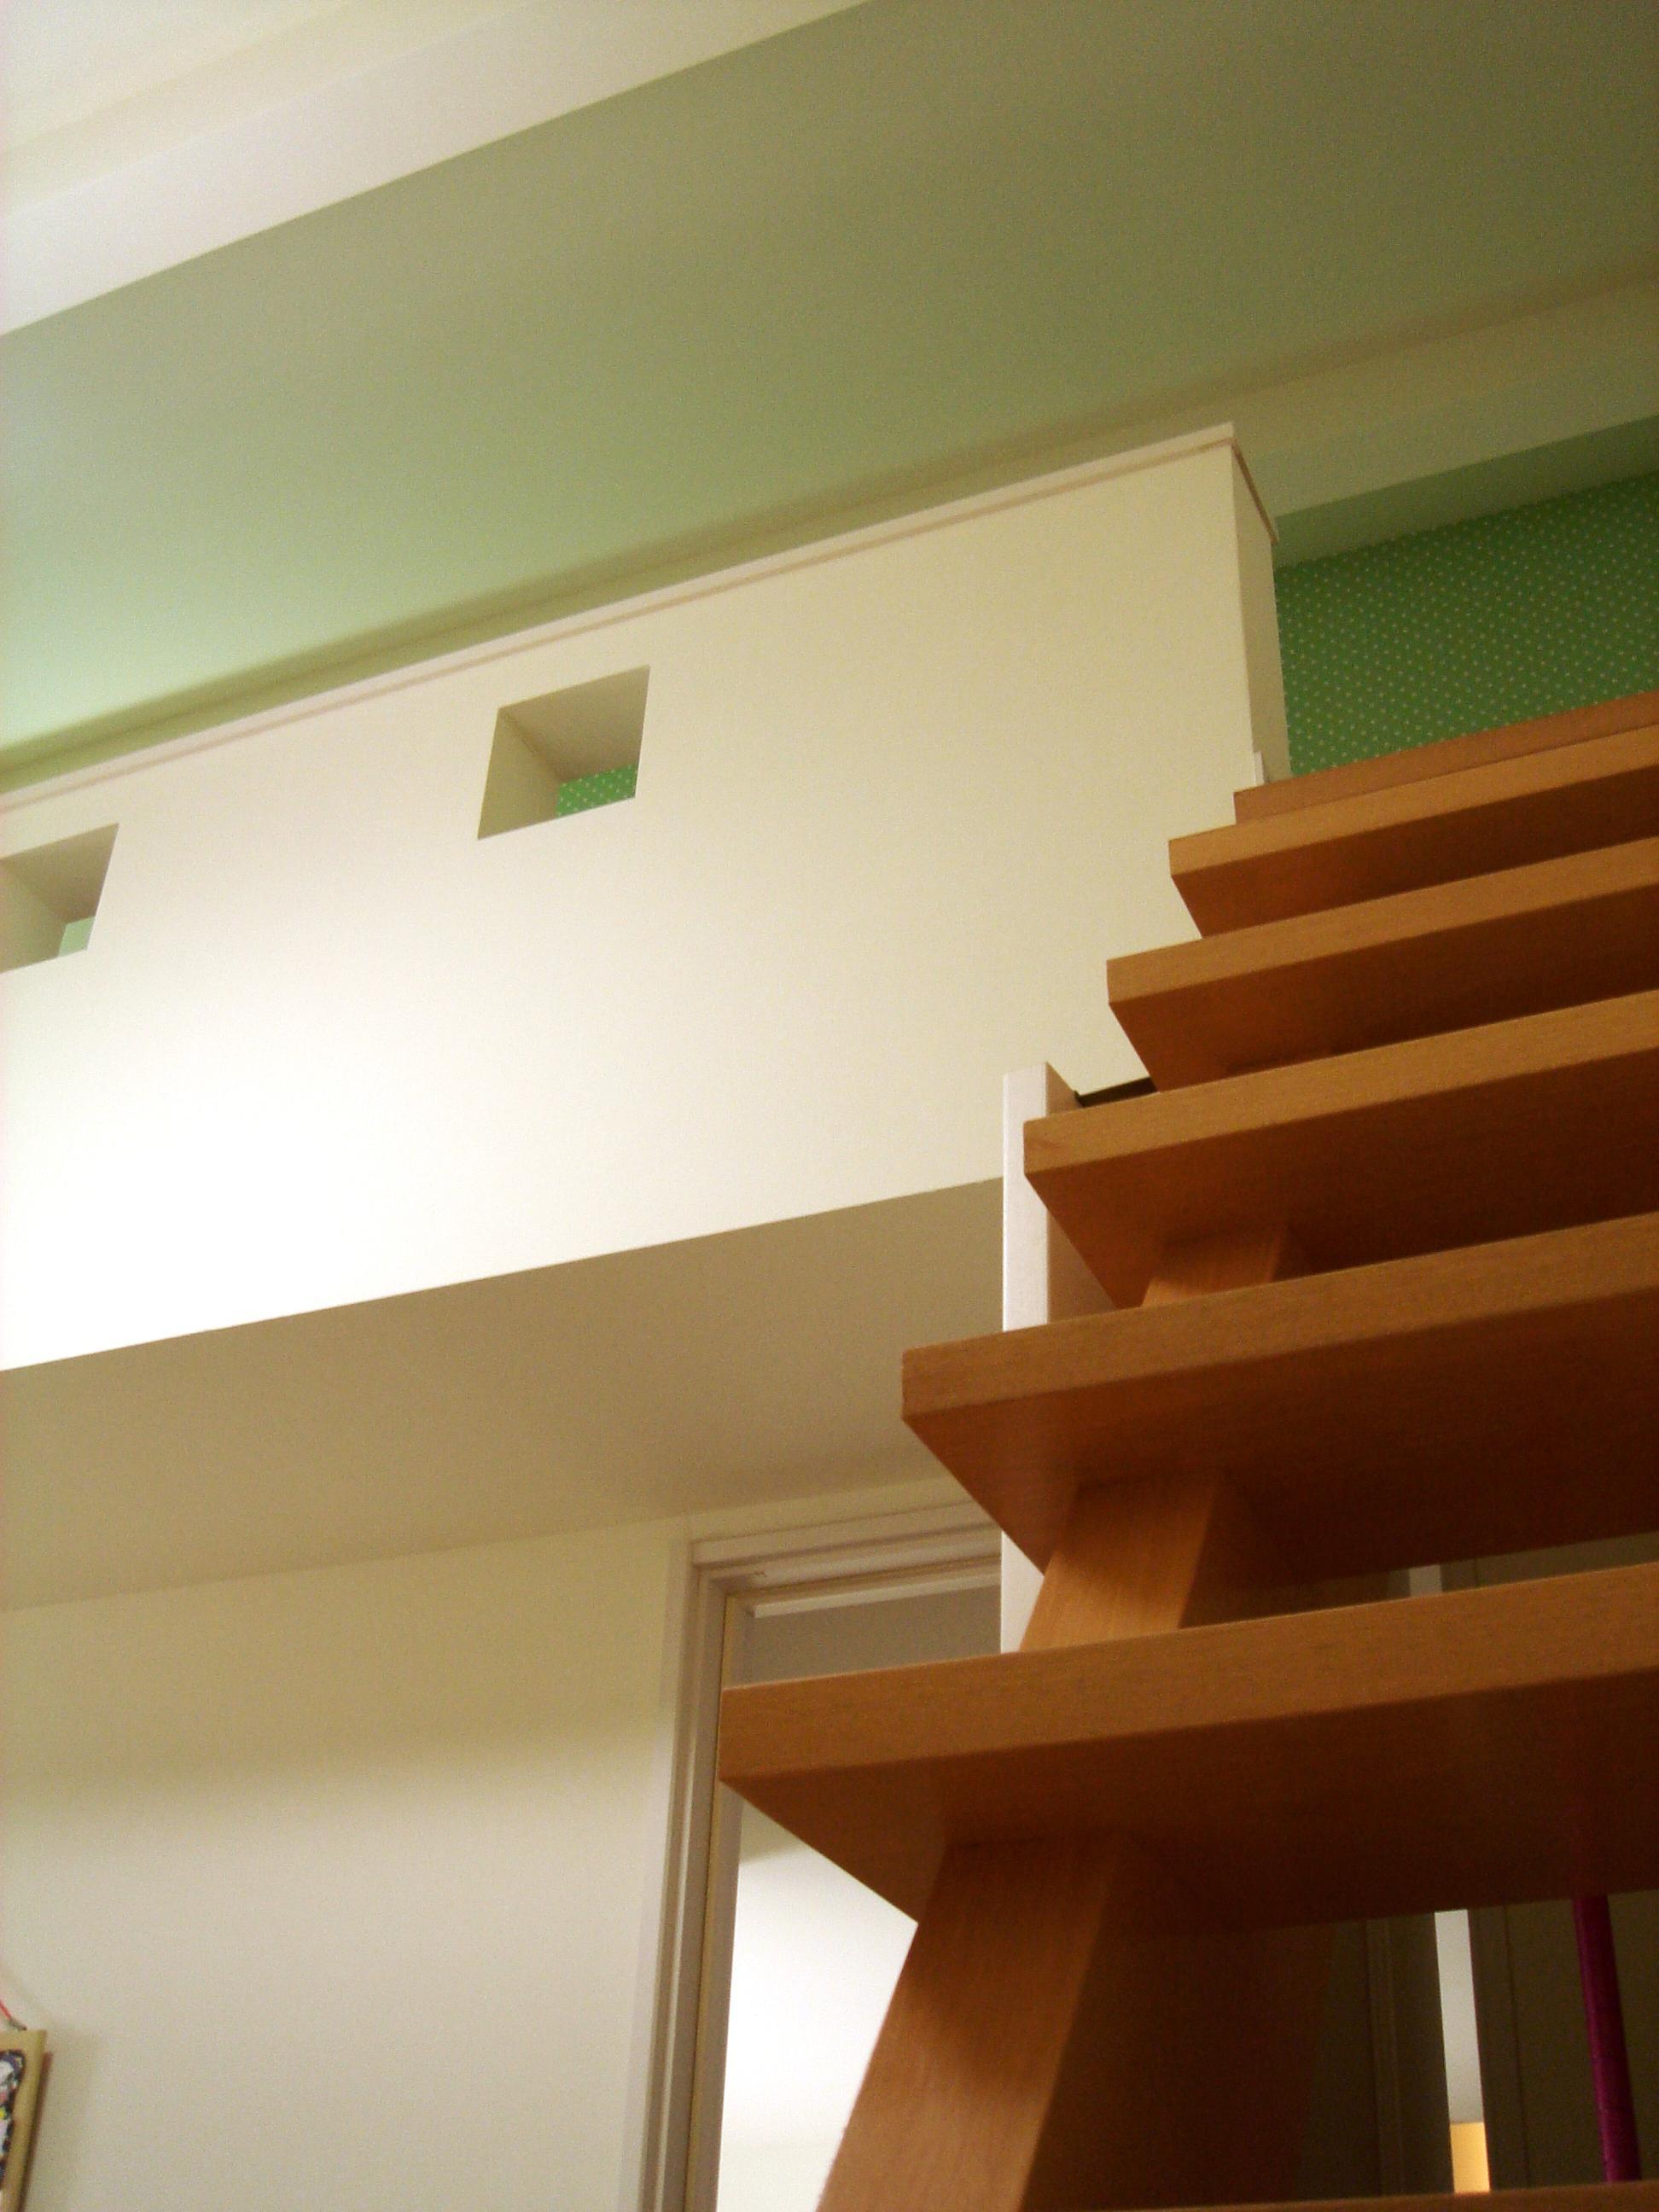 オール電化住宅:千葉県市川市S様邸の写真 ロフト